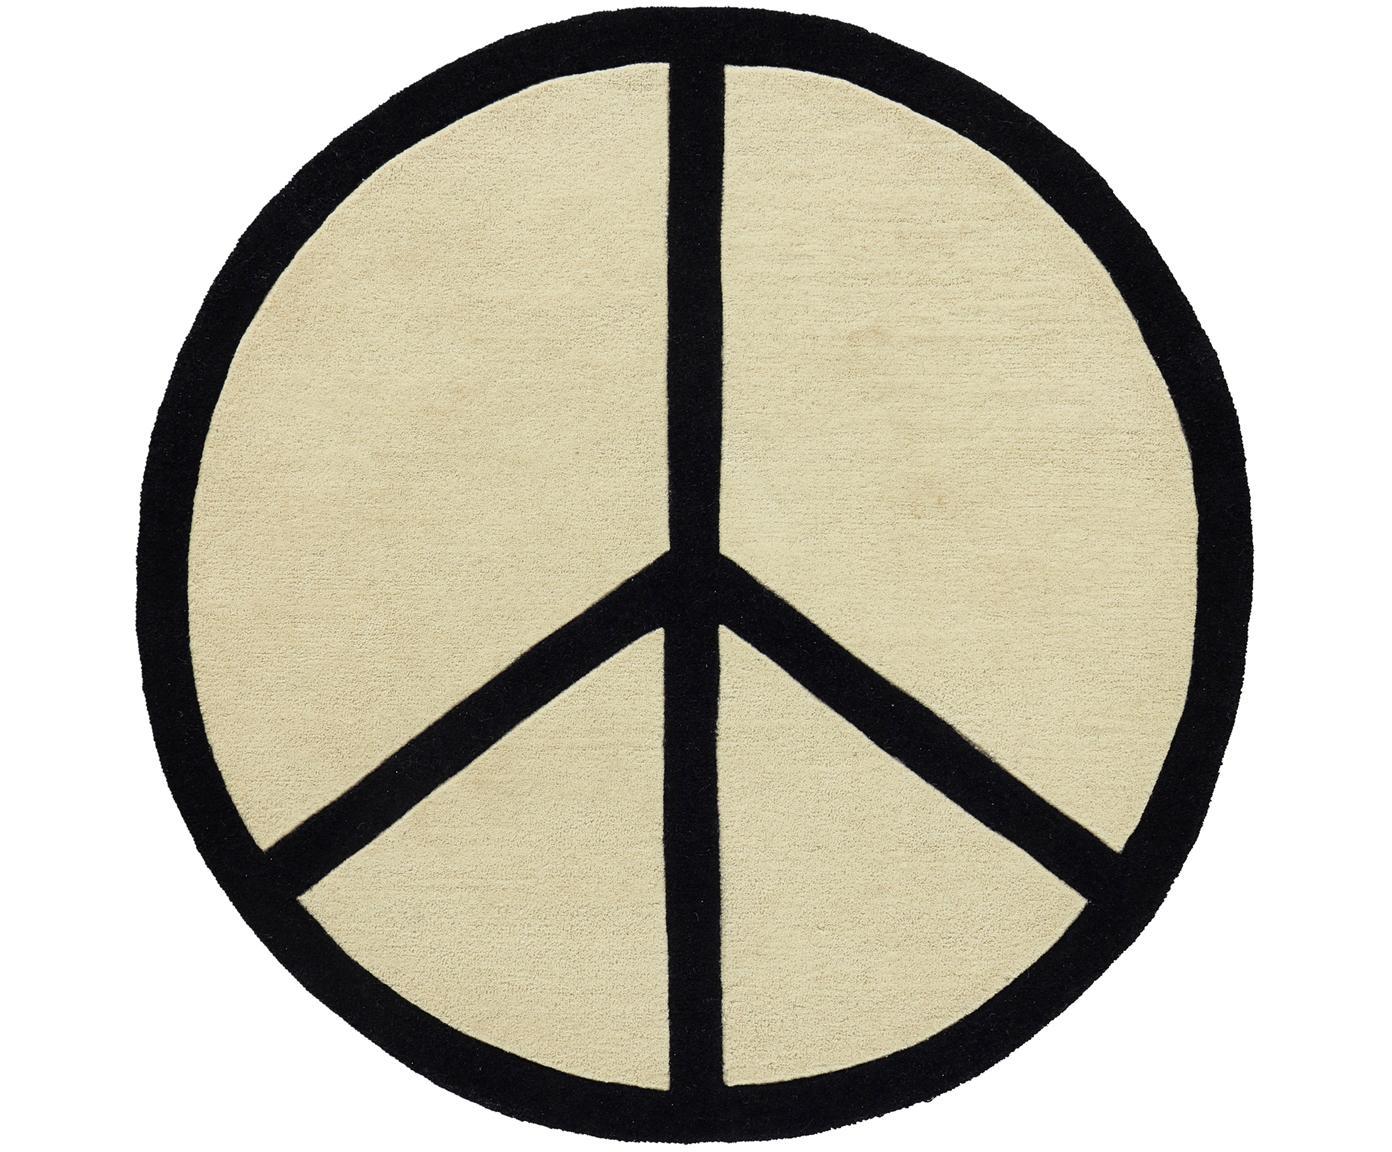 Alfombra redonda Peace Out, 100% lana, Blanco crema, negro, Ø 120 cm